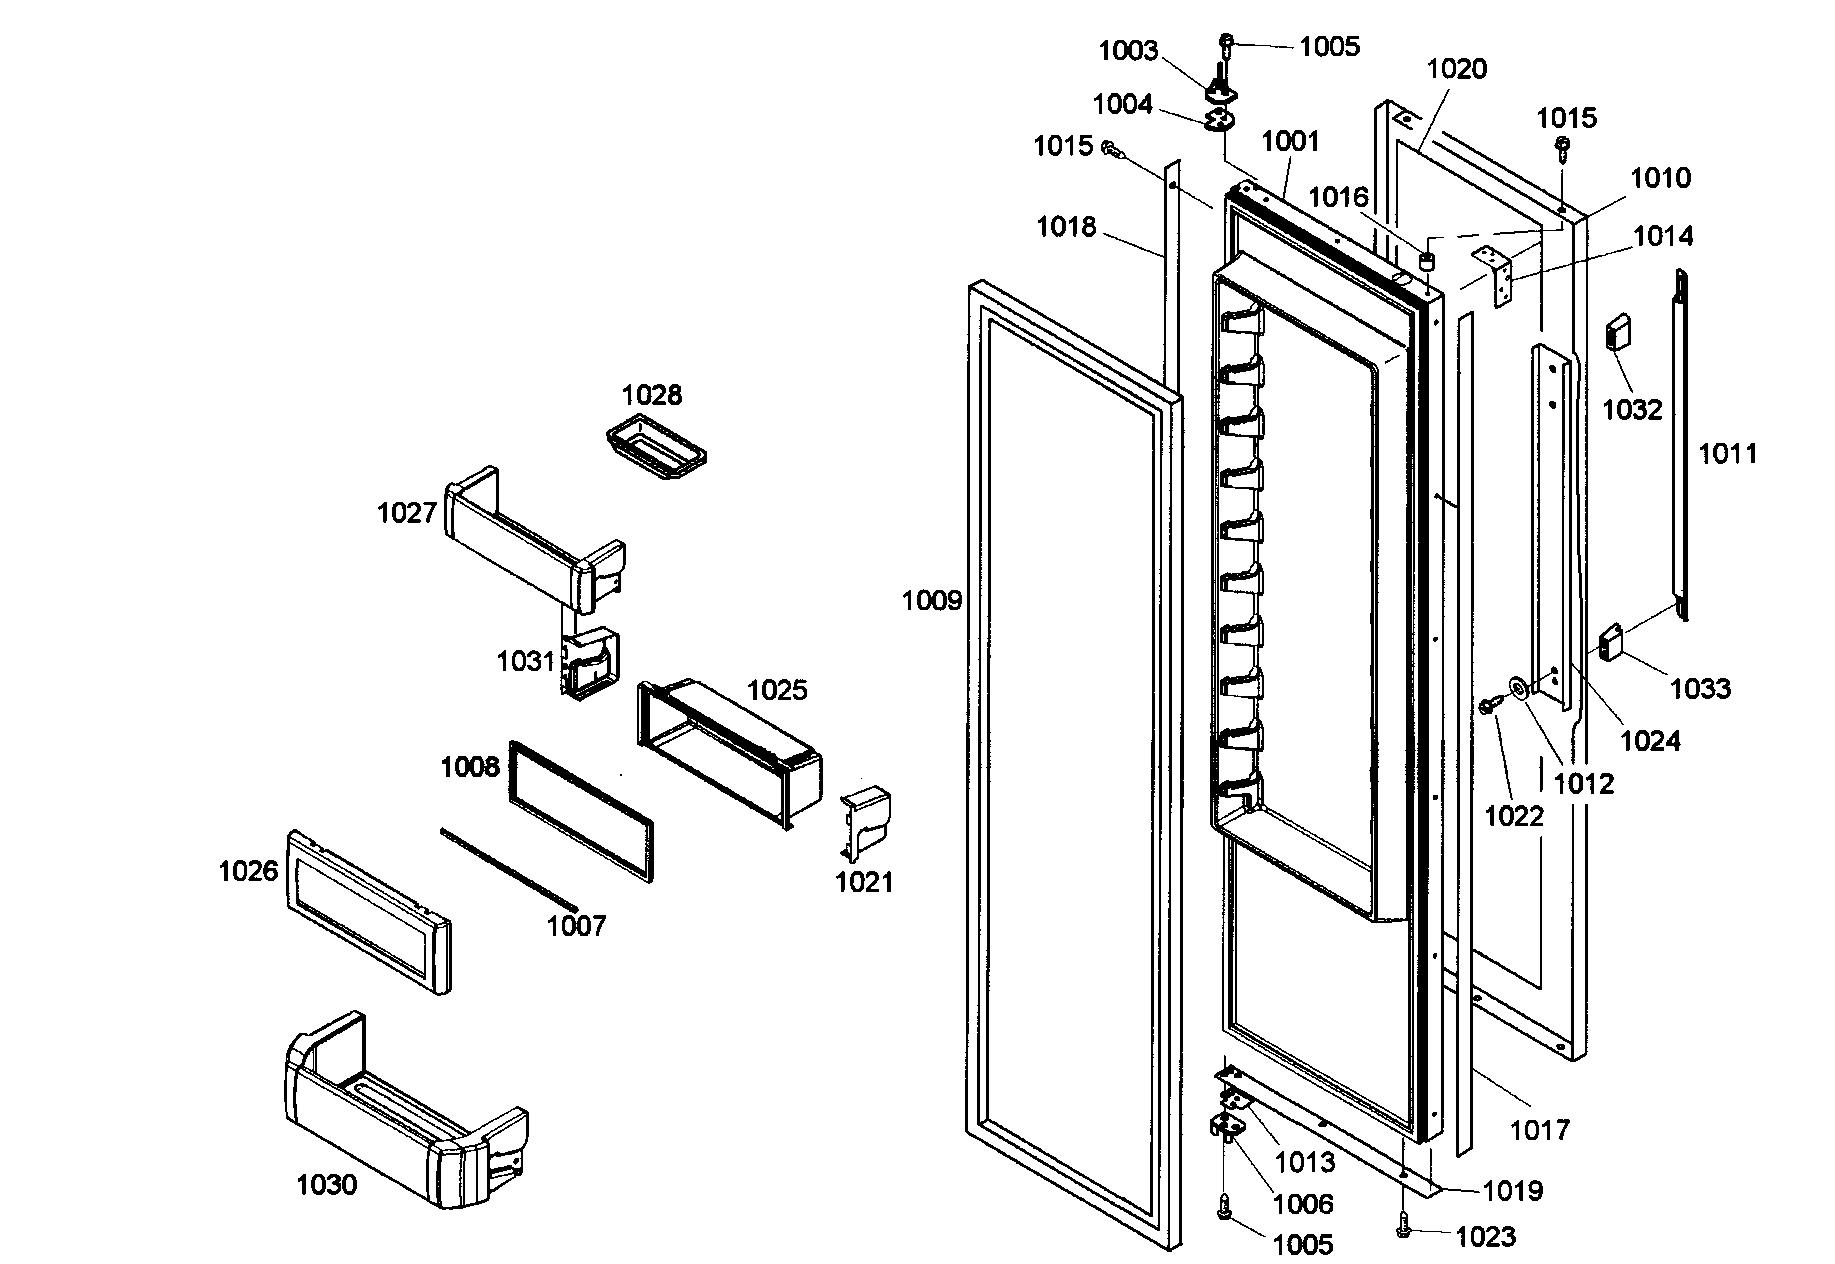 Thermador model KBUDT4255E/01 side-by-side refrigerator